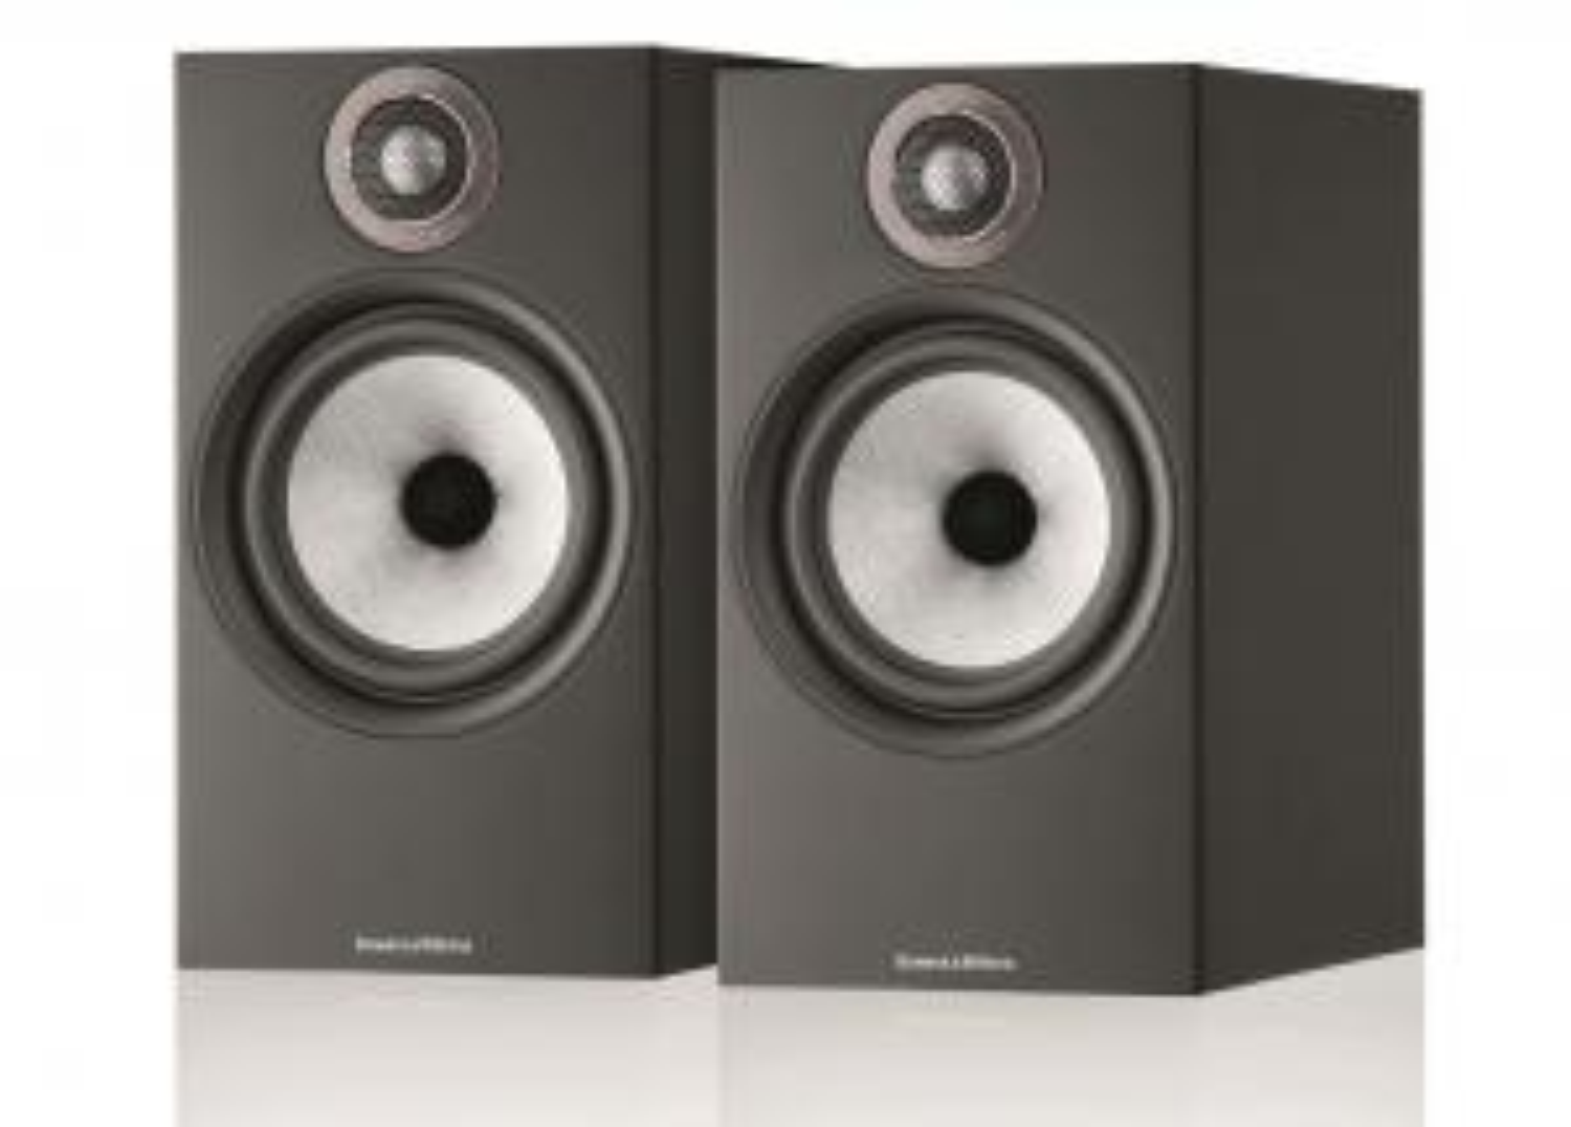 Полочная акустика B&W 607 S2 Anniversary Edition matte black